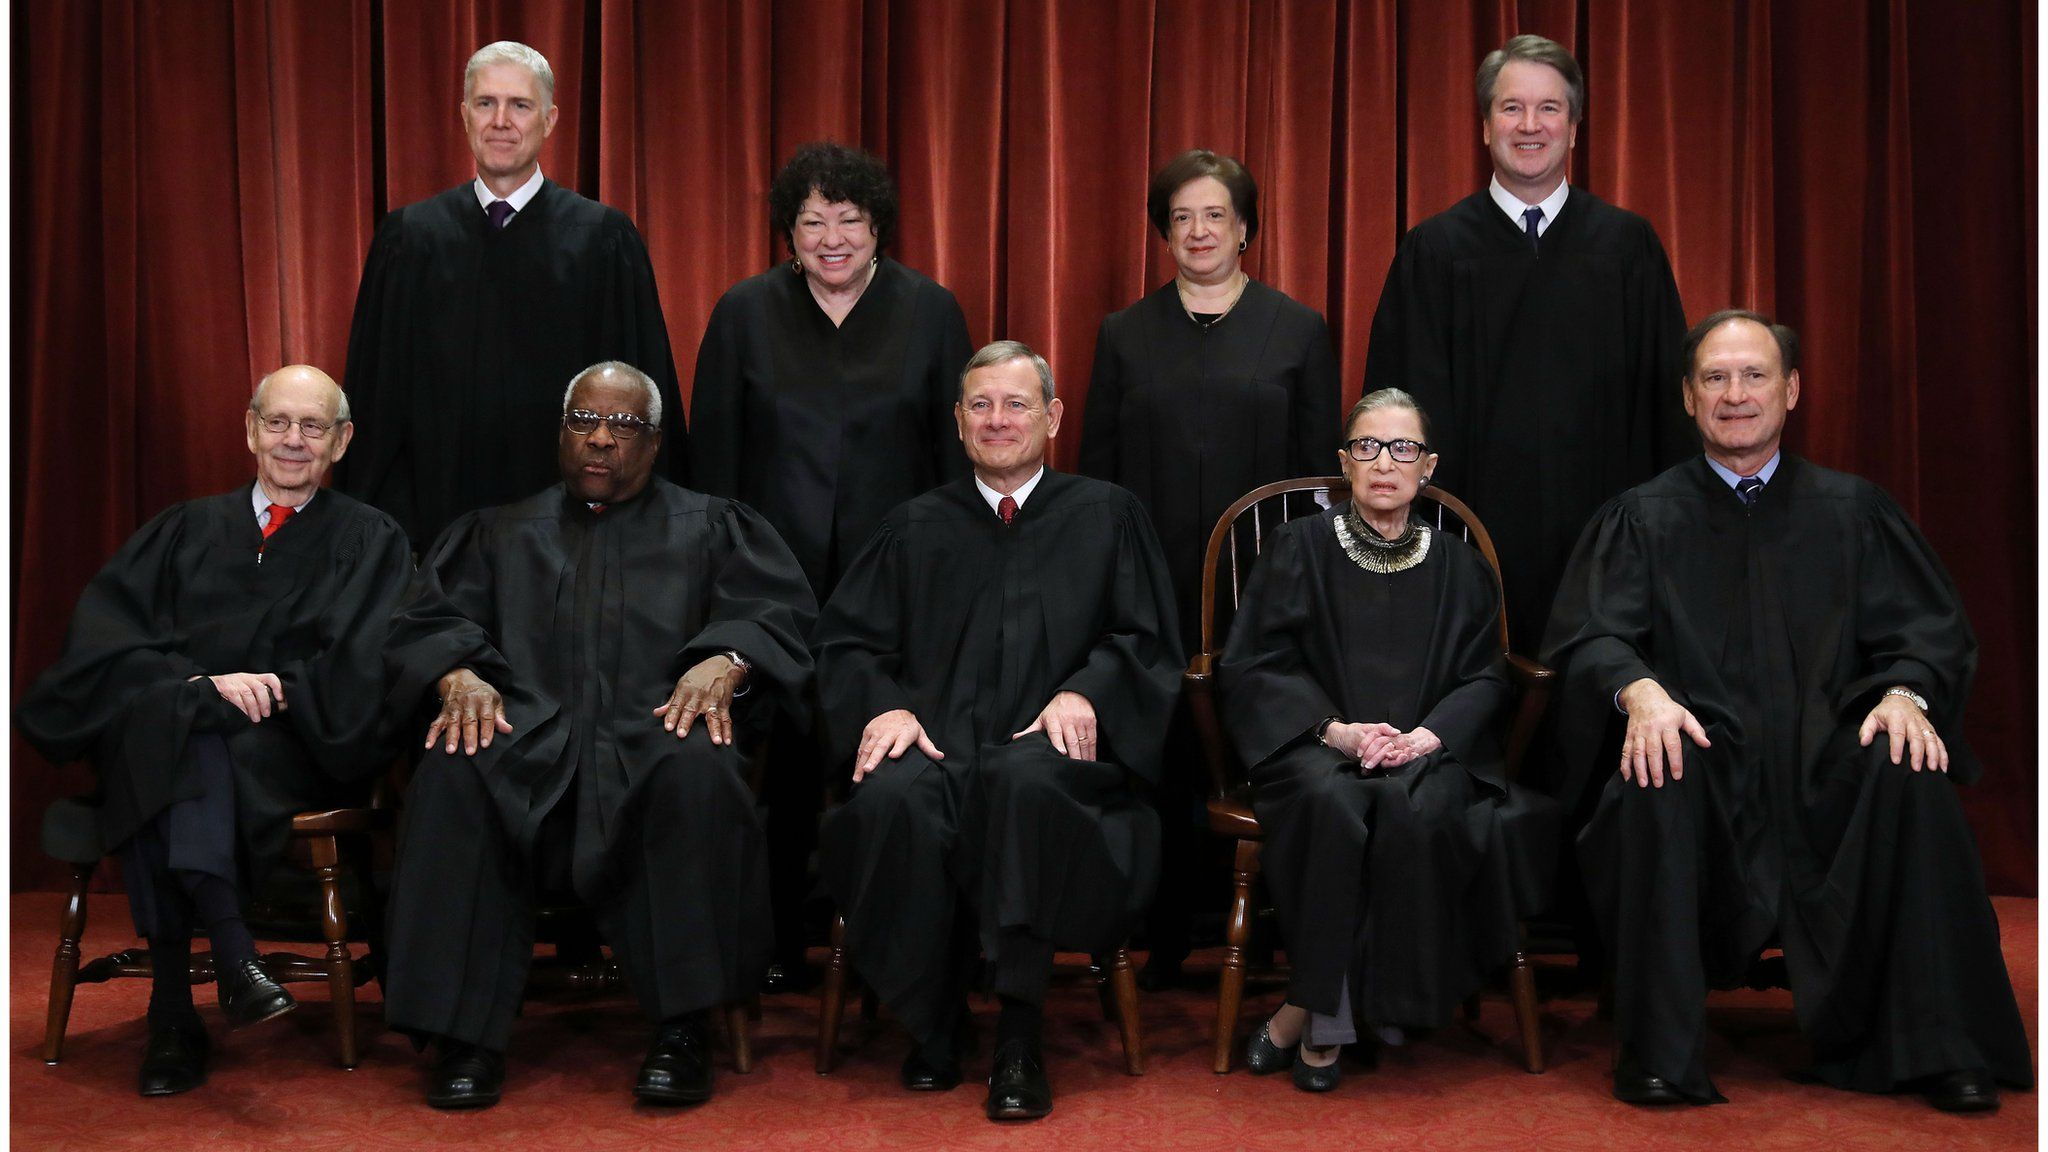 Supreme Court class photo 2018 including new justice Brett Kavanaugh